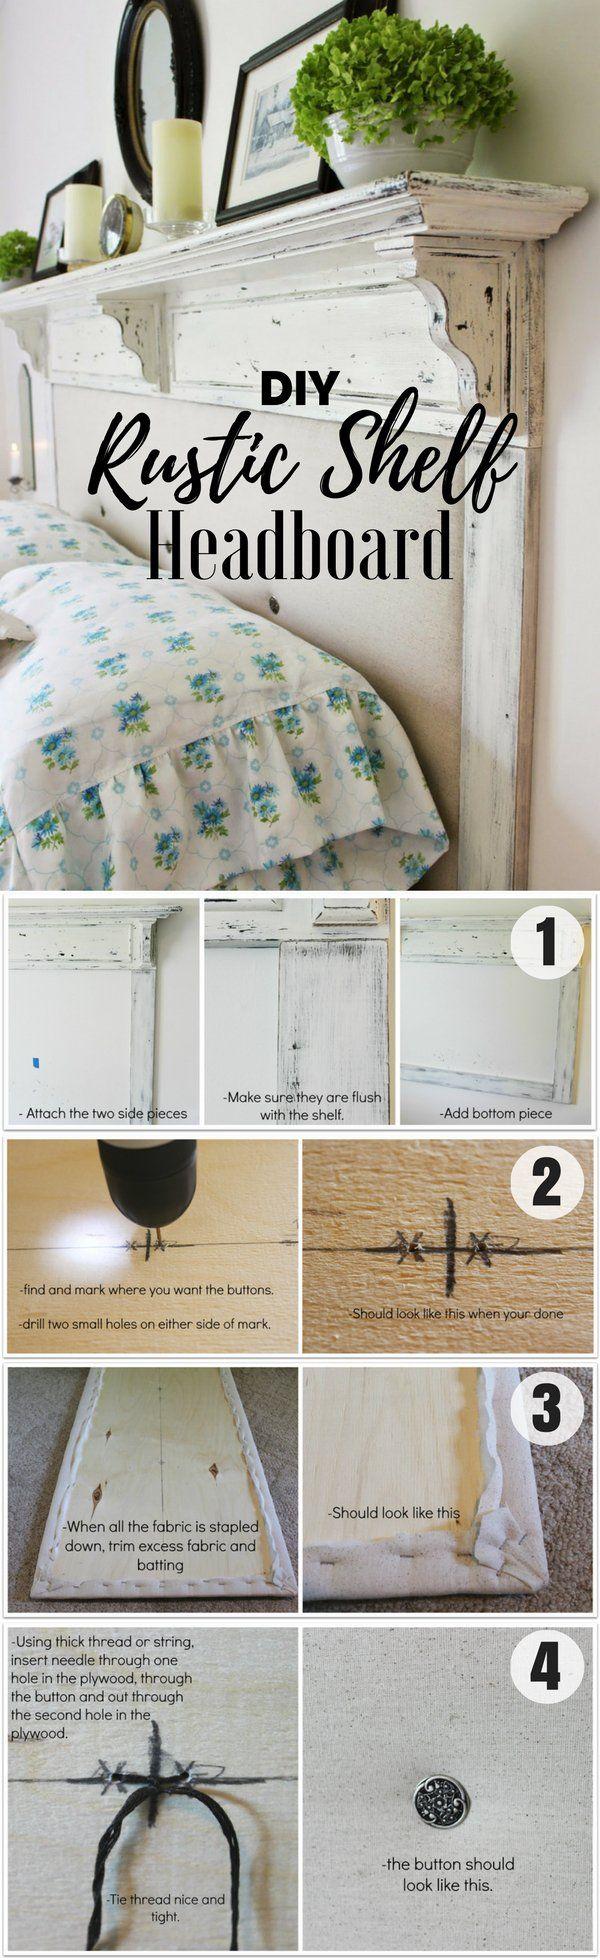 best renovation images on pinterest bedroom ideas